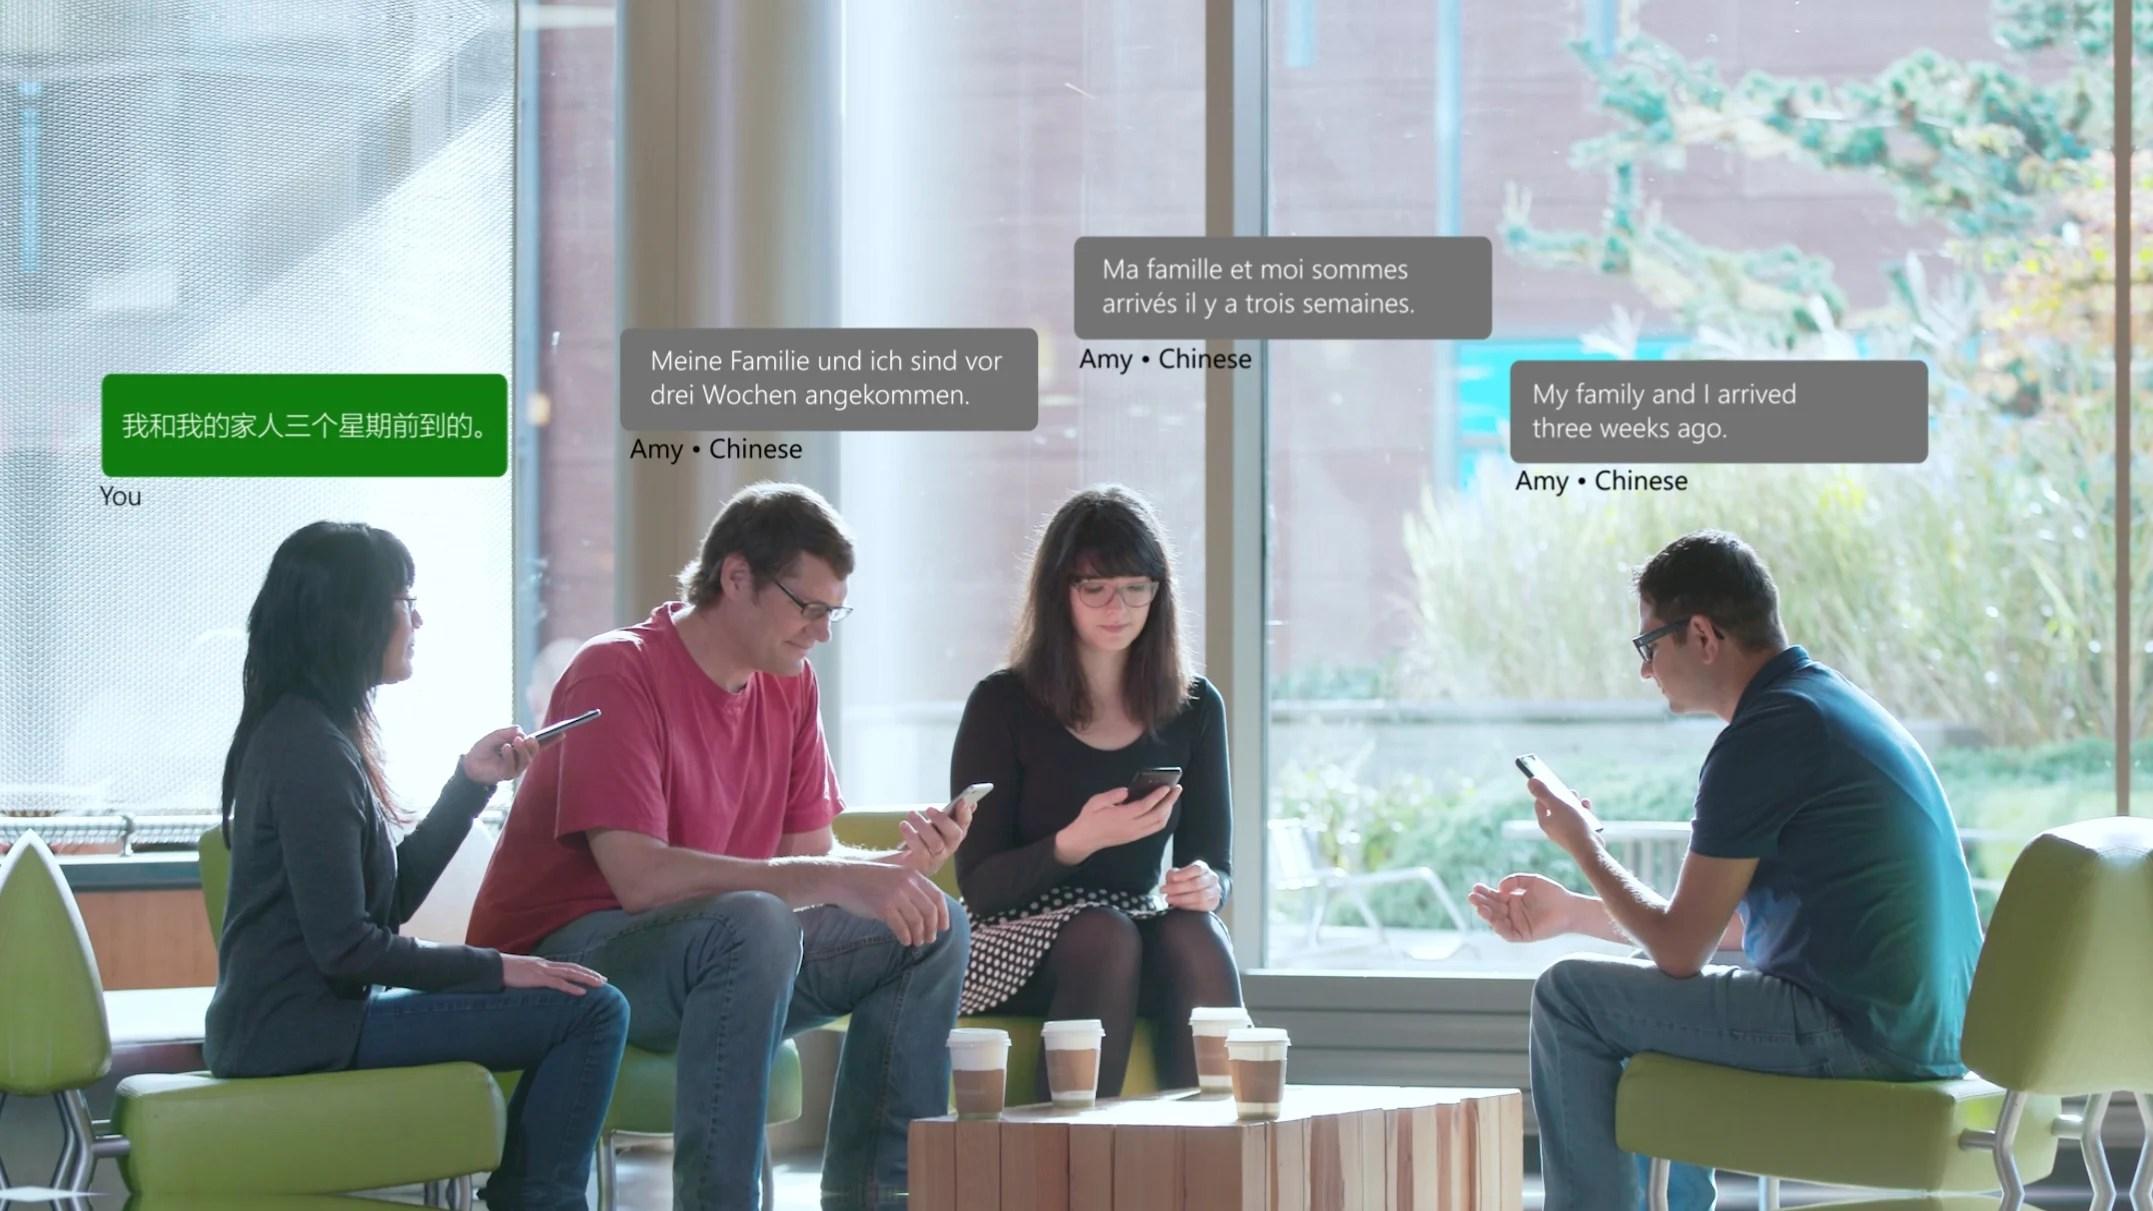 Microsoft Translator intègre un mode conversation très malin